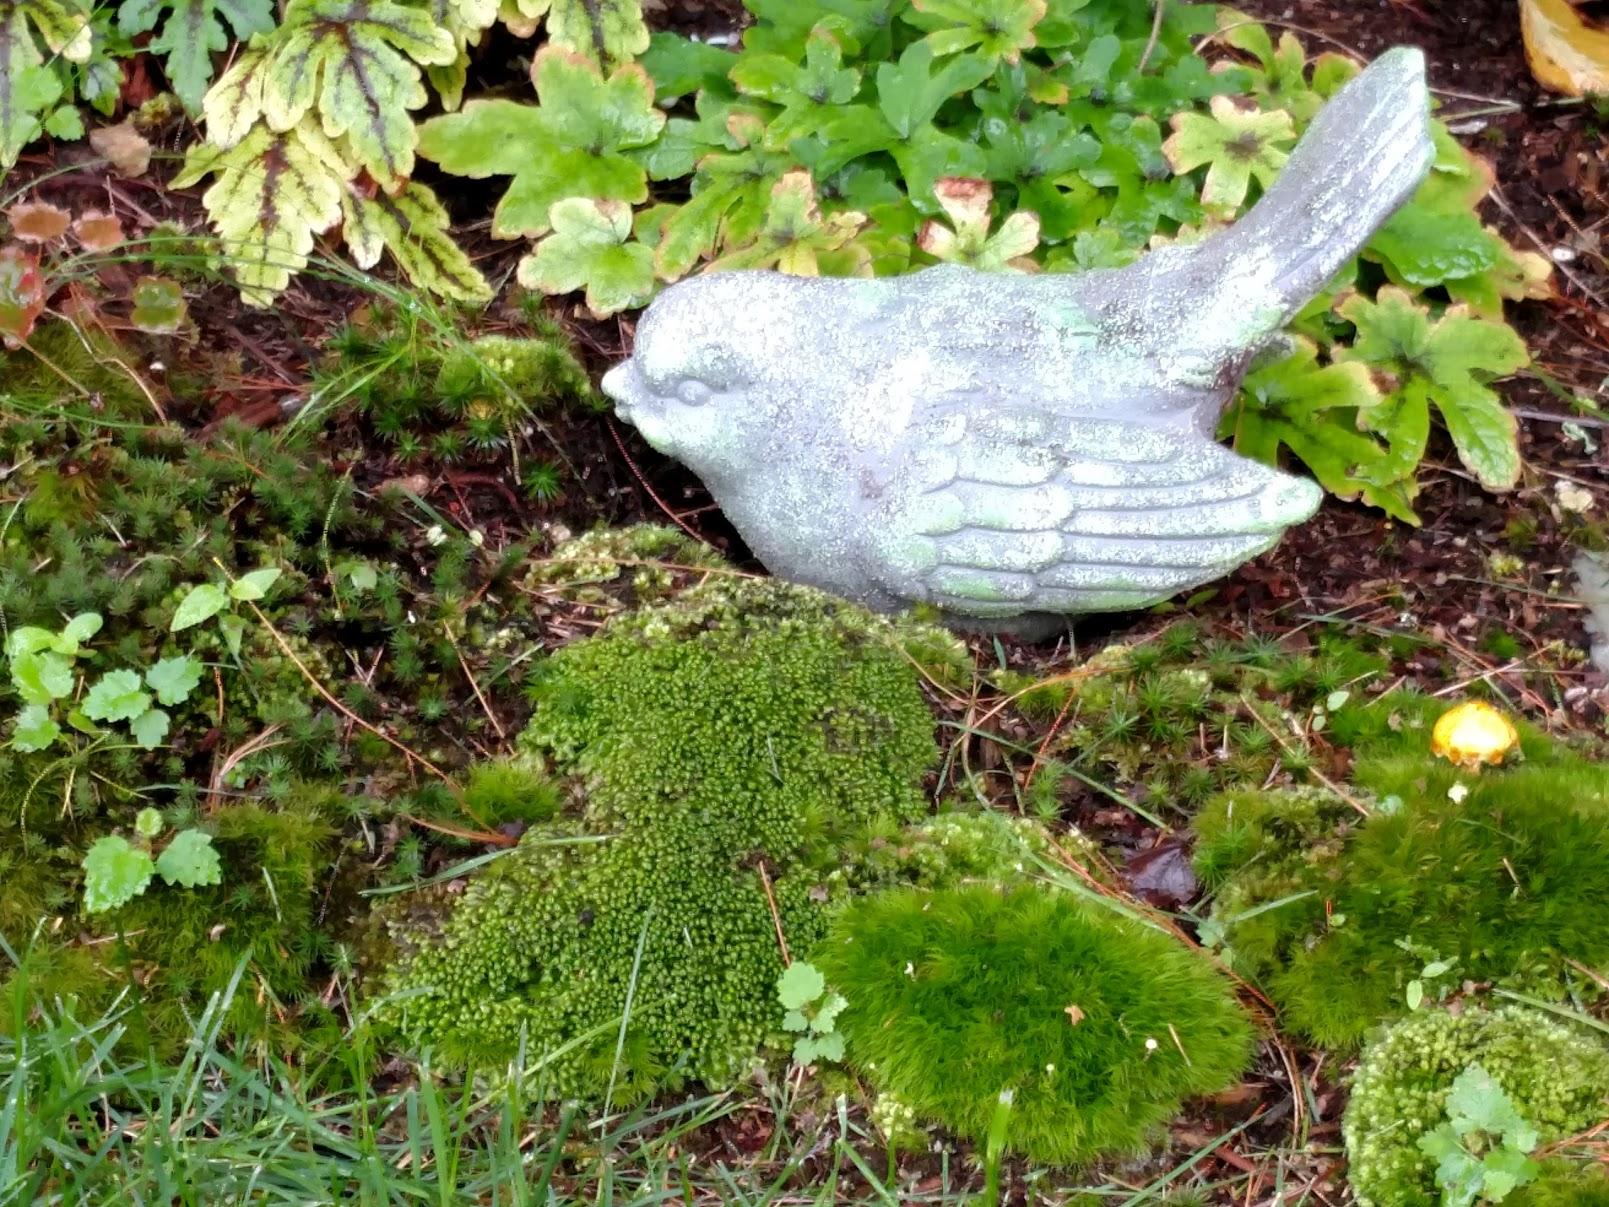 Moss with bird